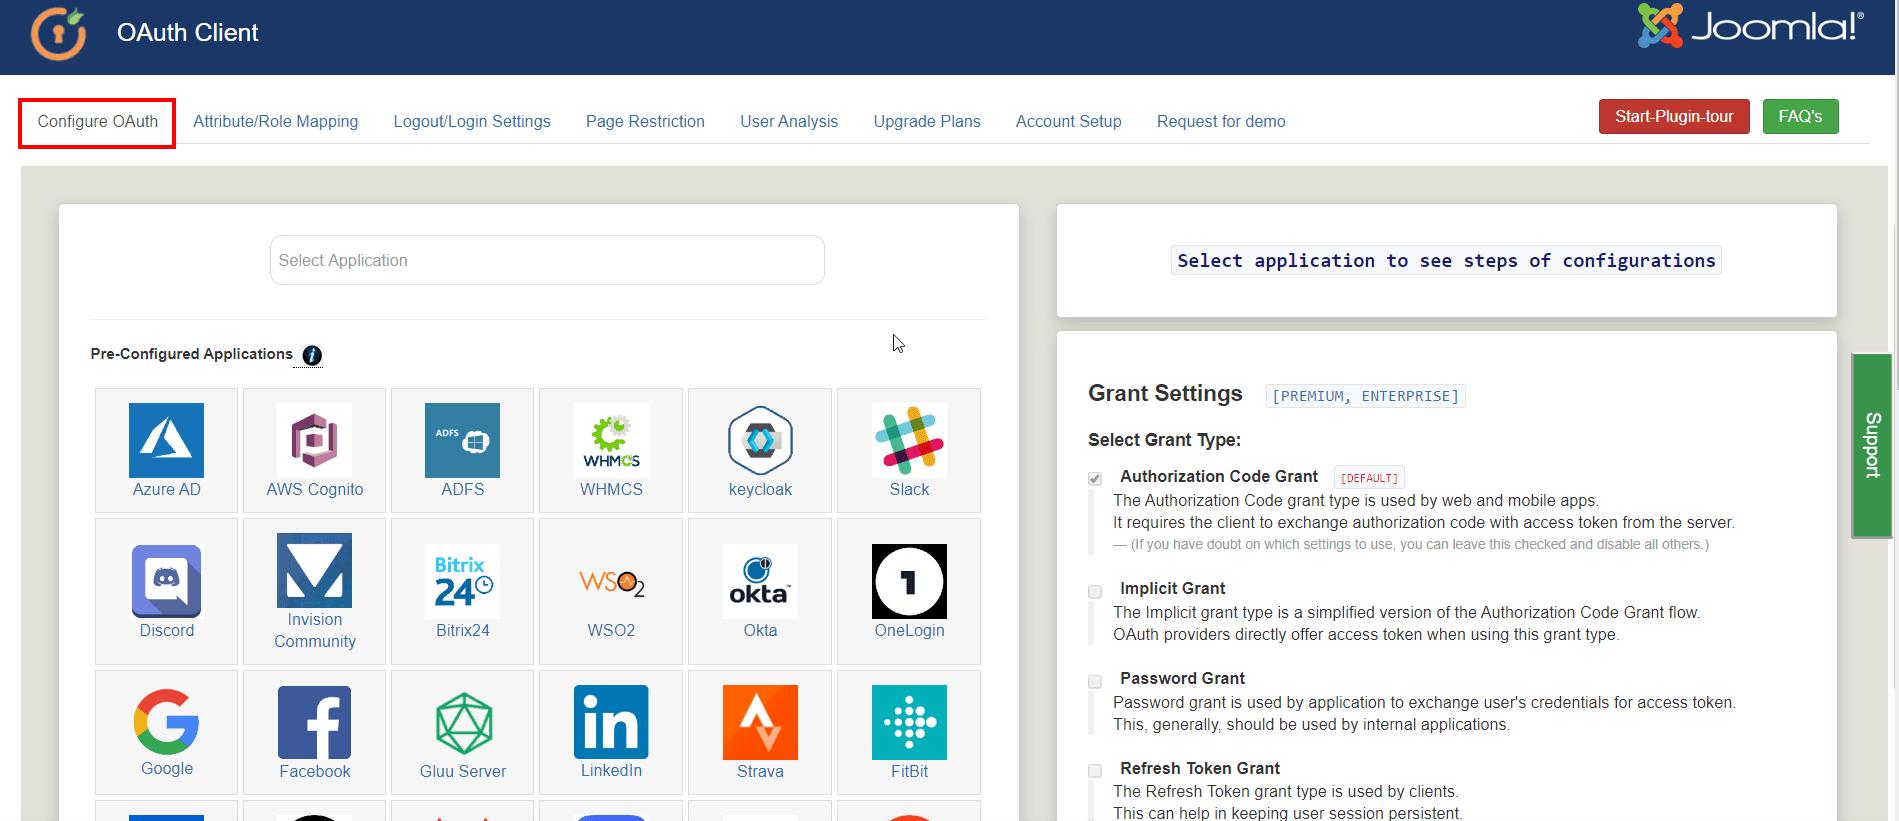 Joomla OAuth Client Plugin - Configure OAuth